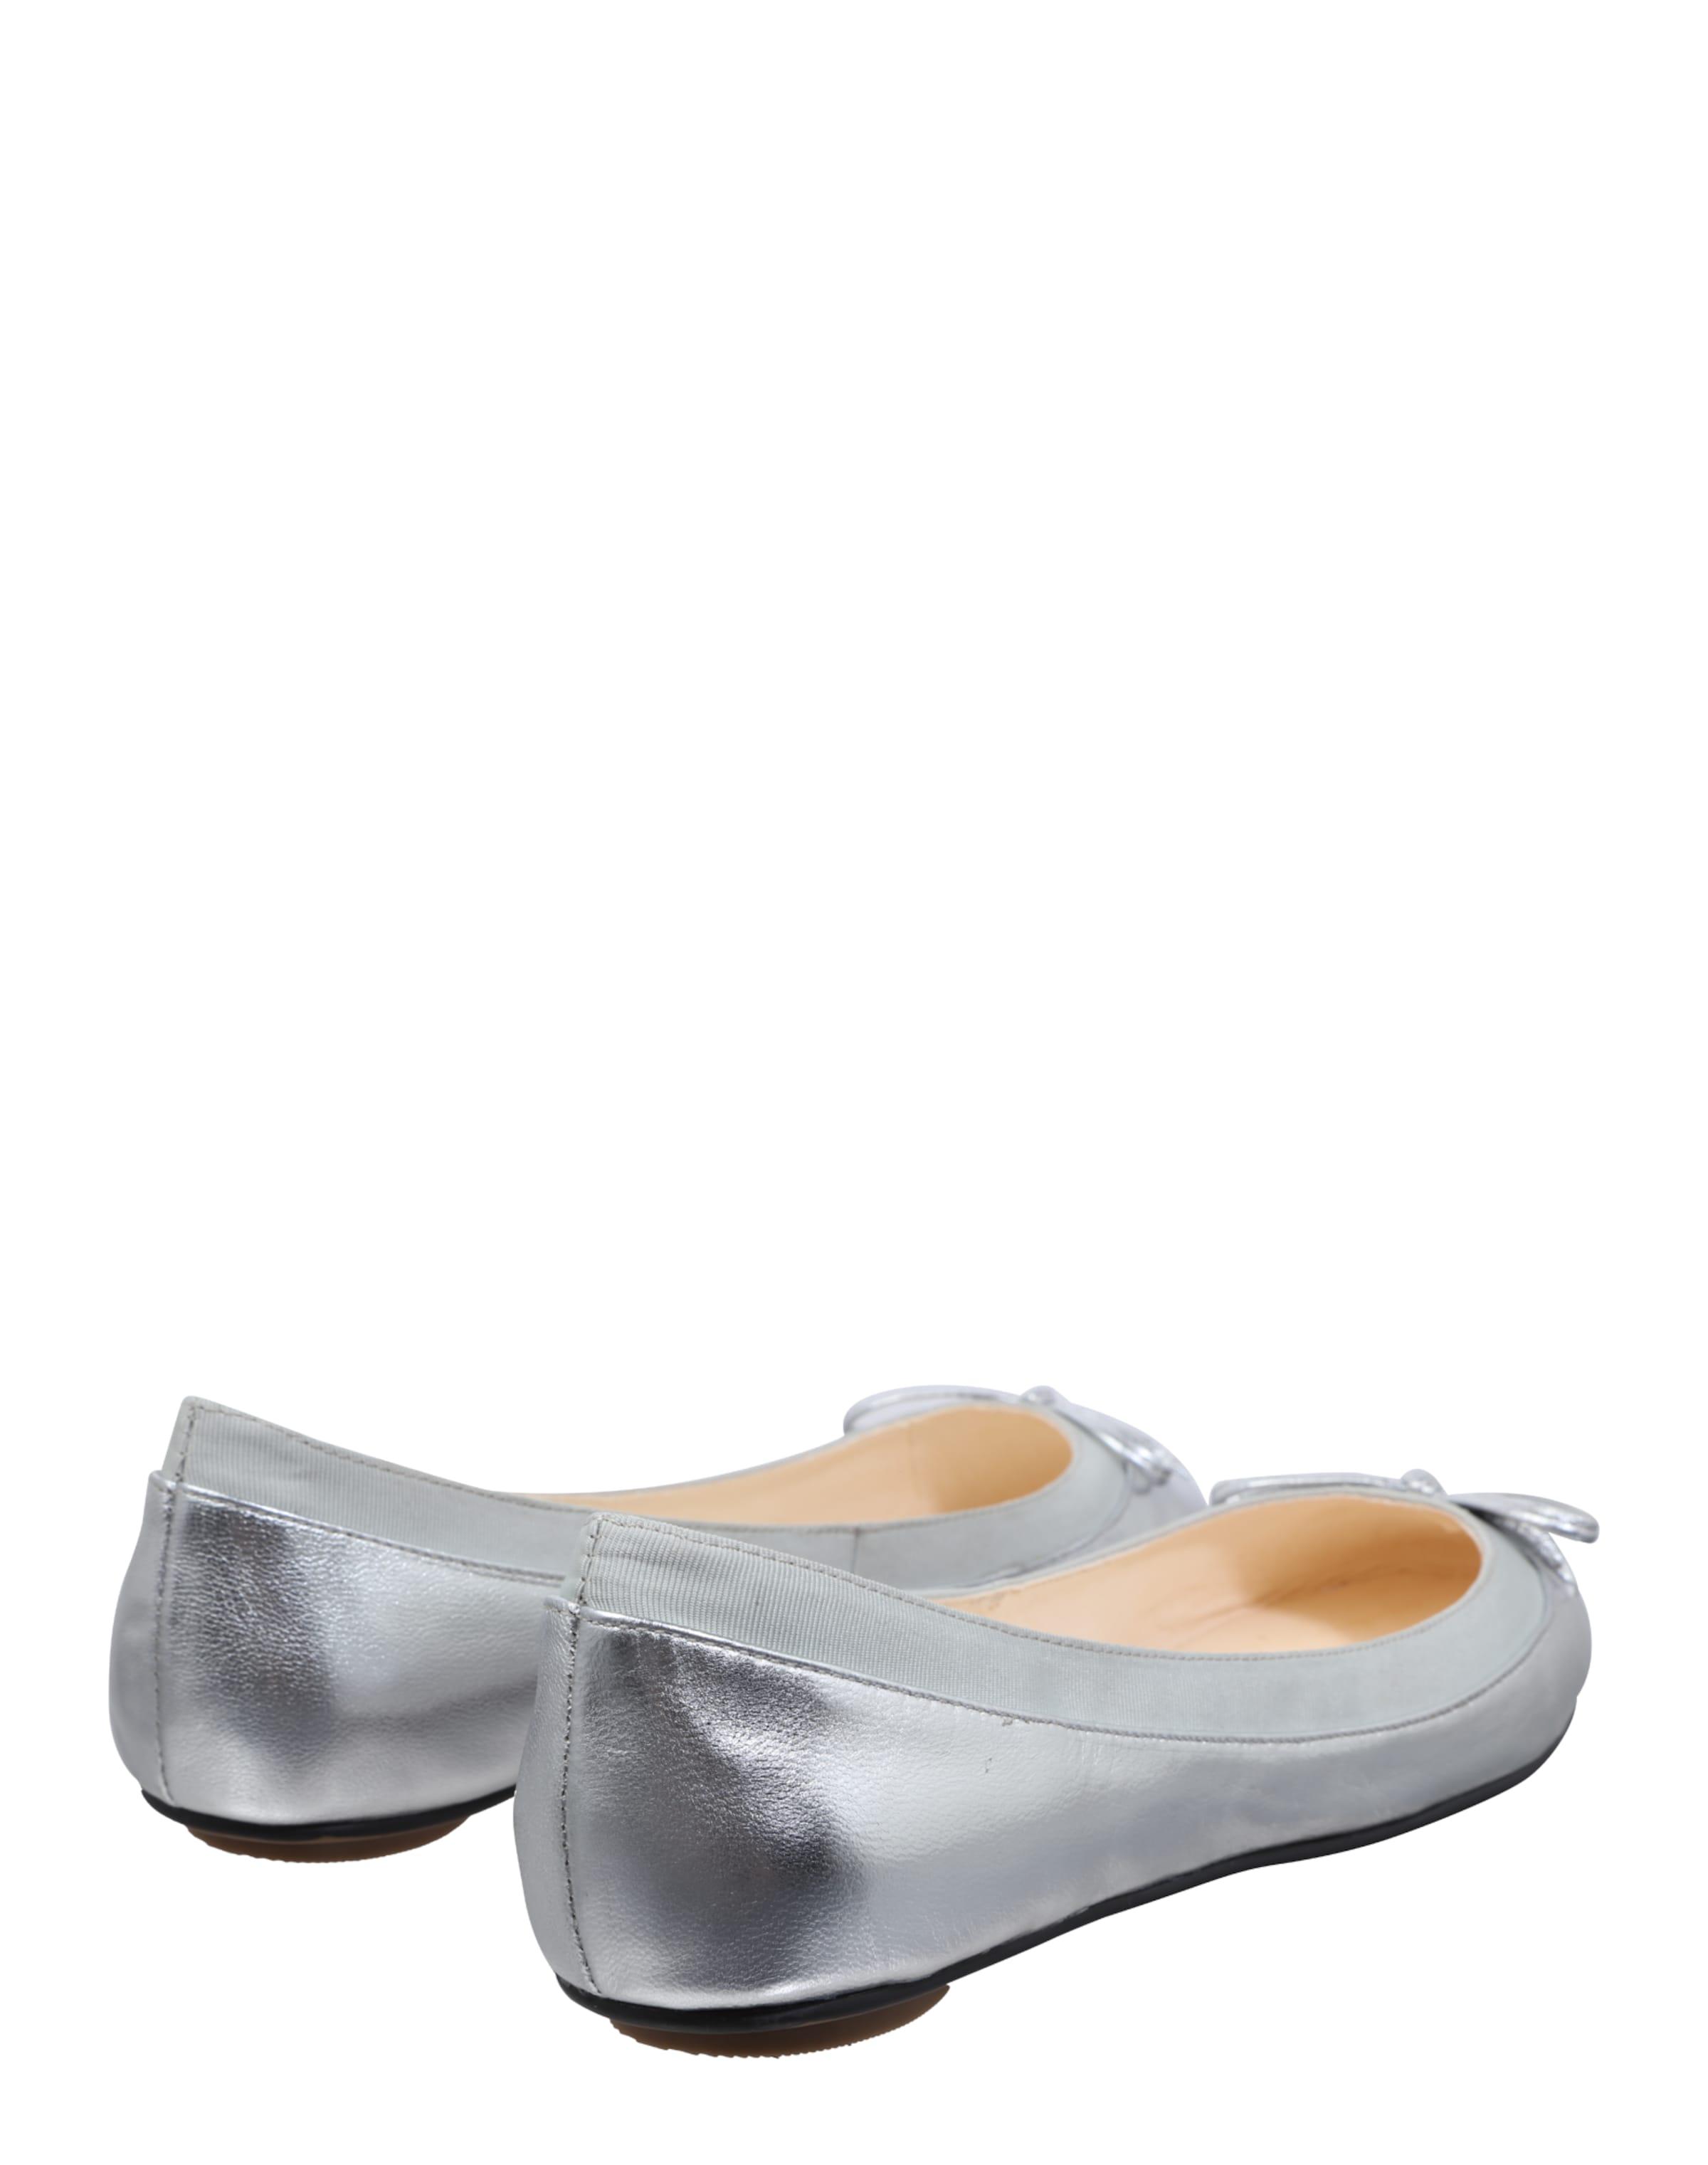 BUFFALO Ballerinas Neue Stile Zu Verkaufen Auslass 100% Original sIrGBIlC5